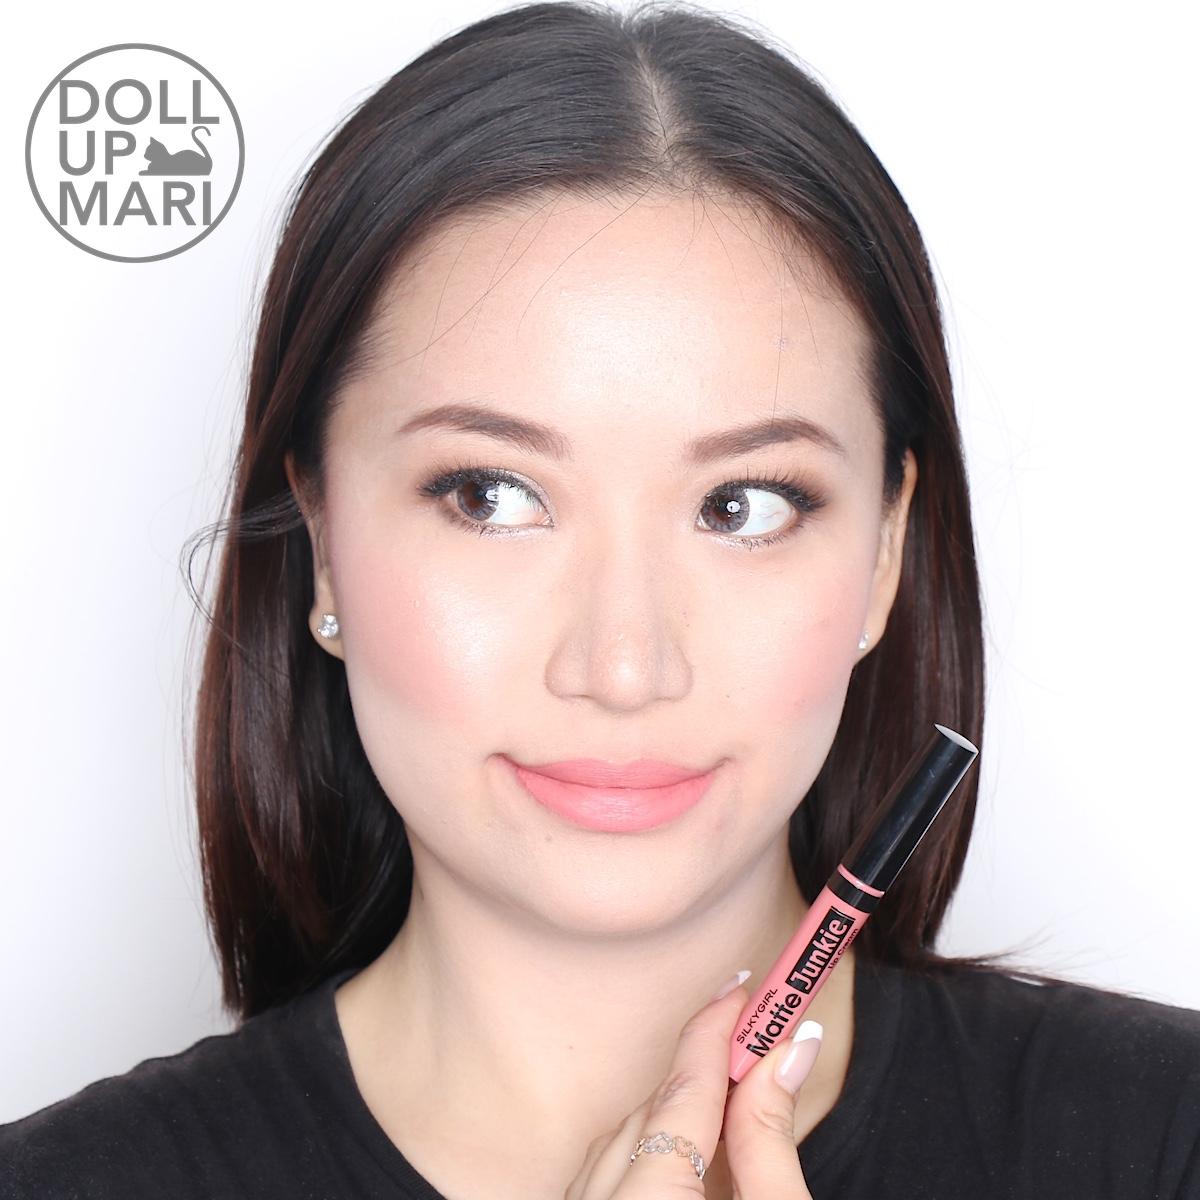 Silkygirl Matte Junkie Lip Cream 02 Glamour 5 8ml Daftar Harga Silky Girl 09 Rounge 405016 Wearing